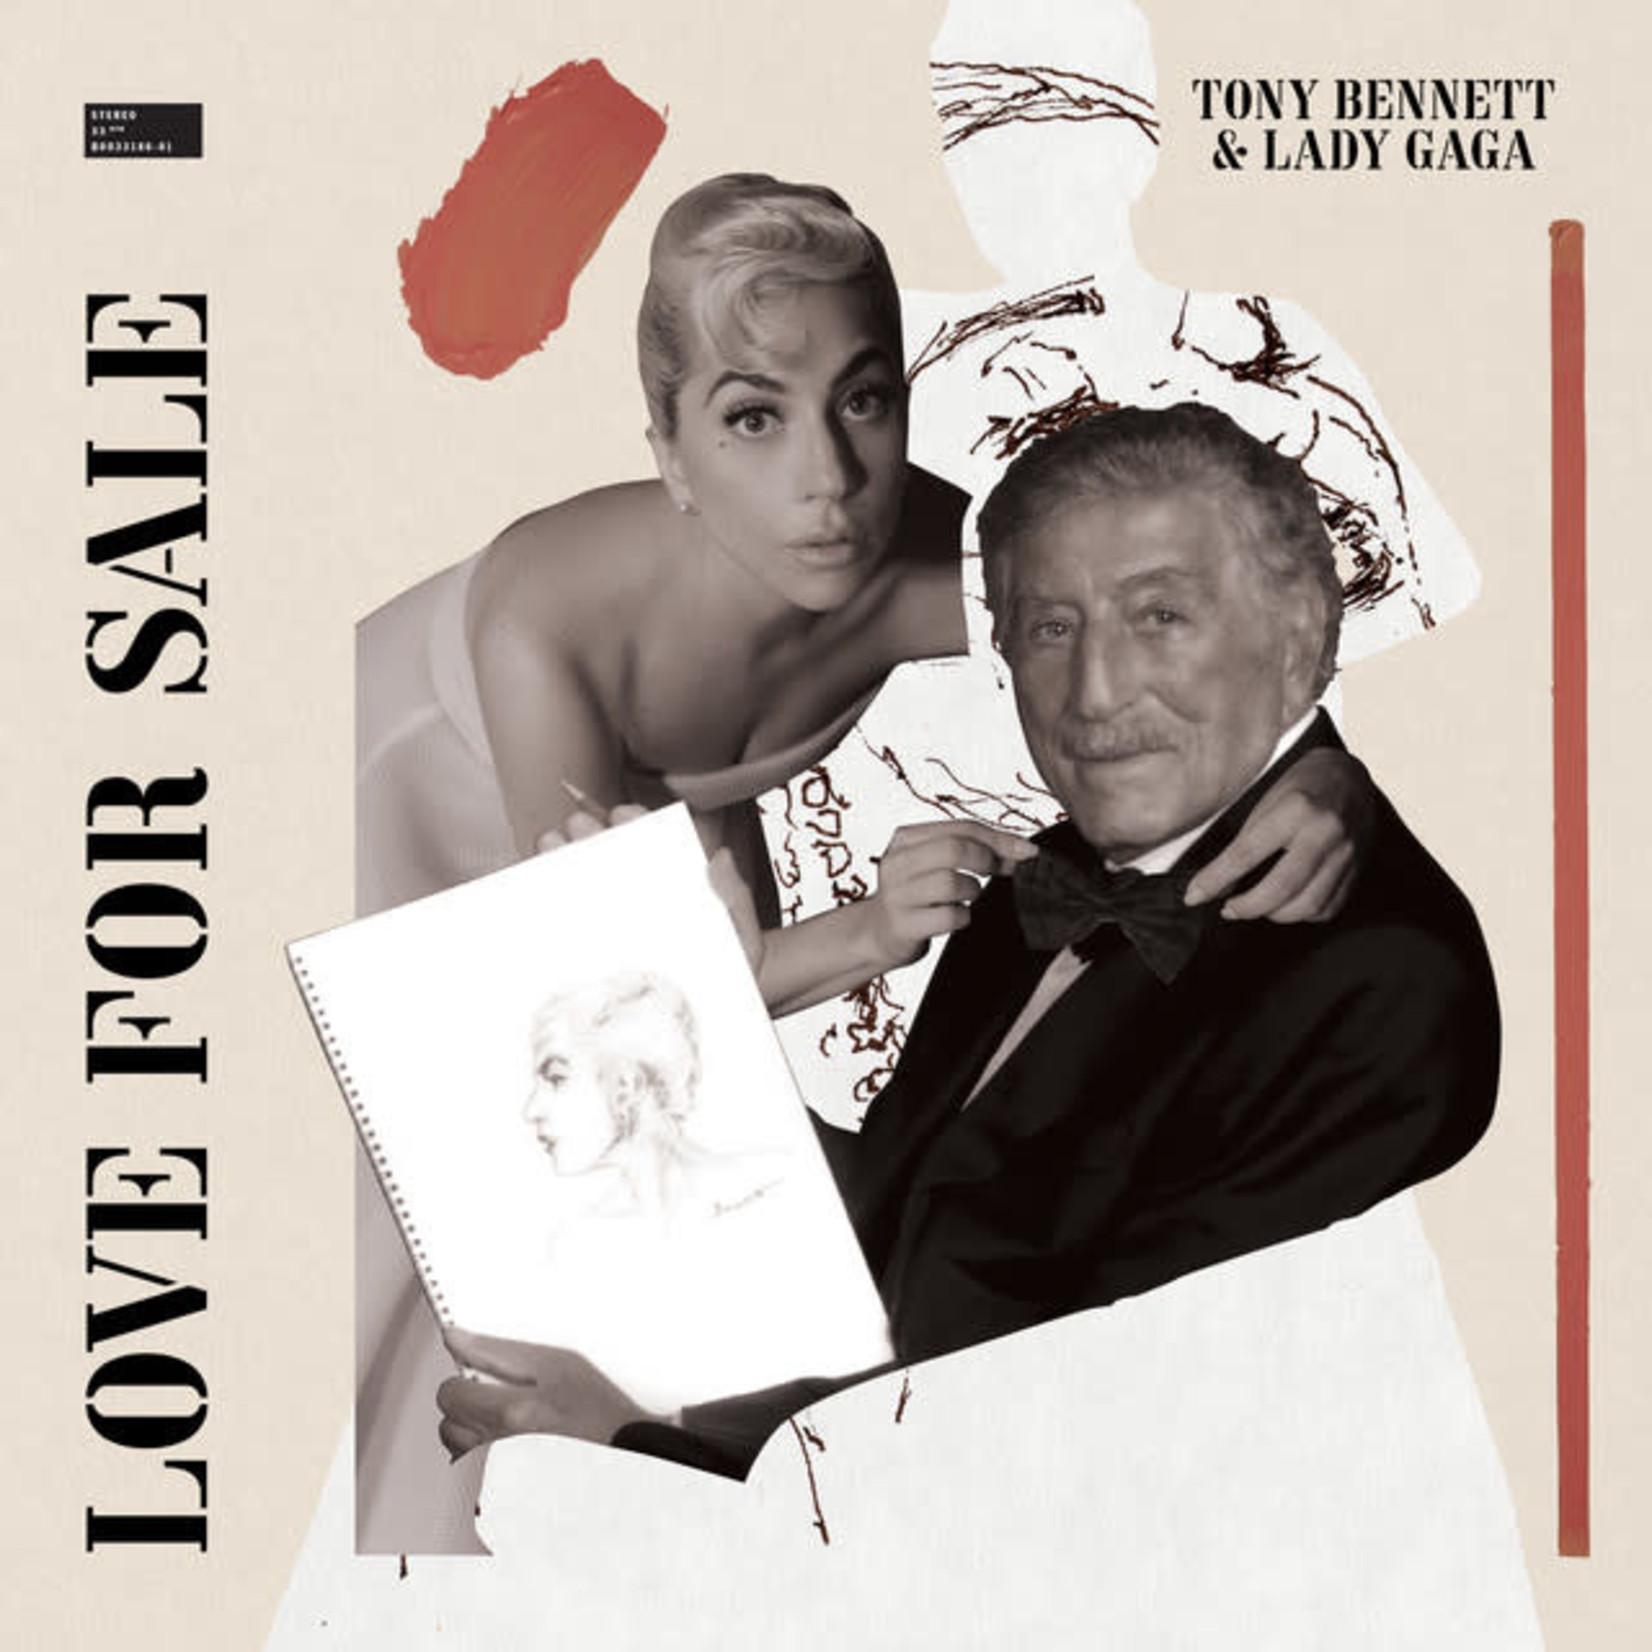 [New] Bennett, Tony & Lady Gaga: Love For Sale [INTERSCOPE]